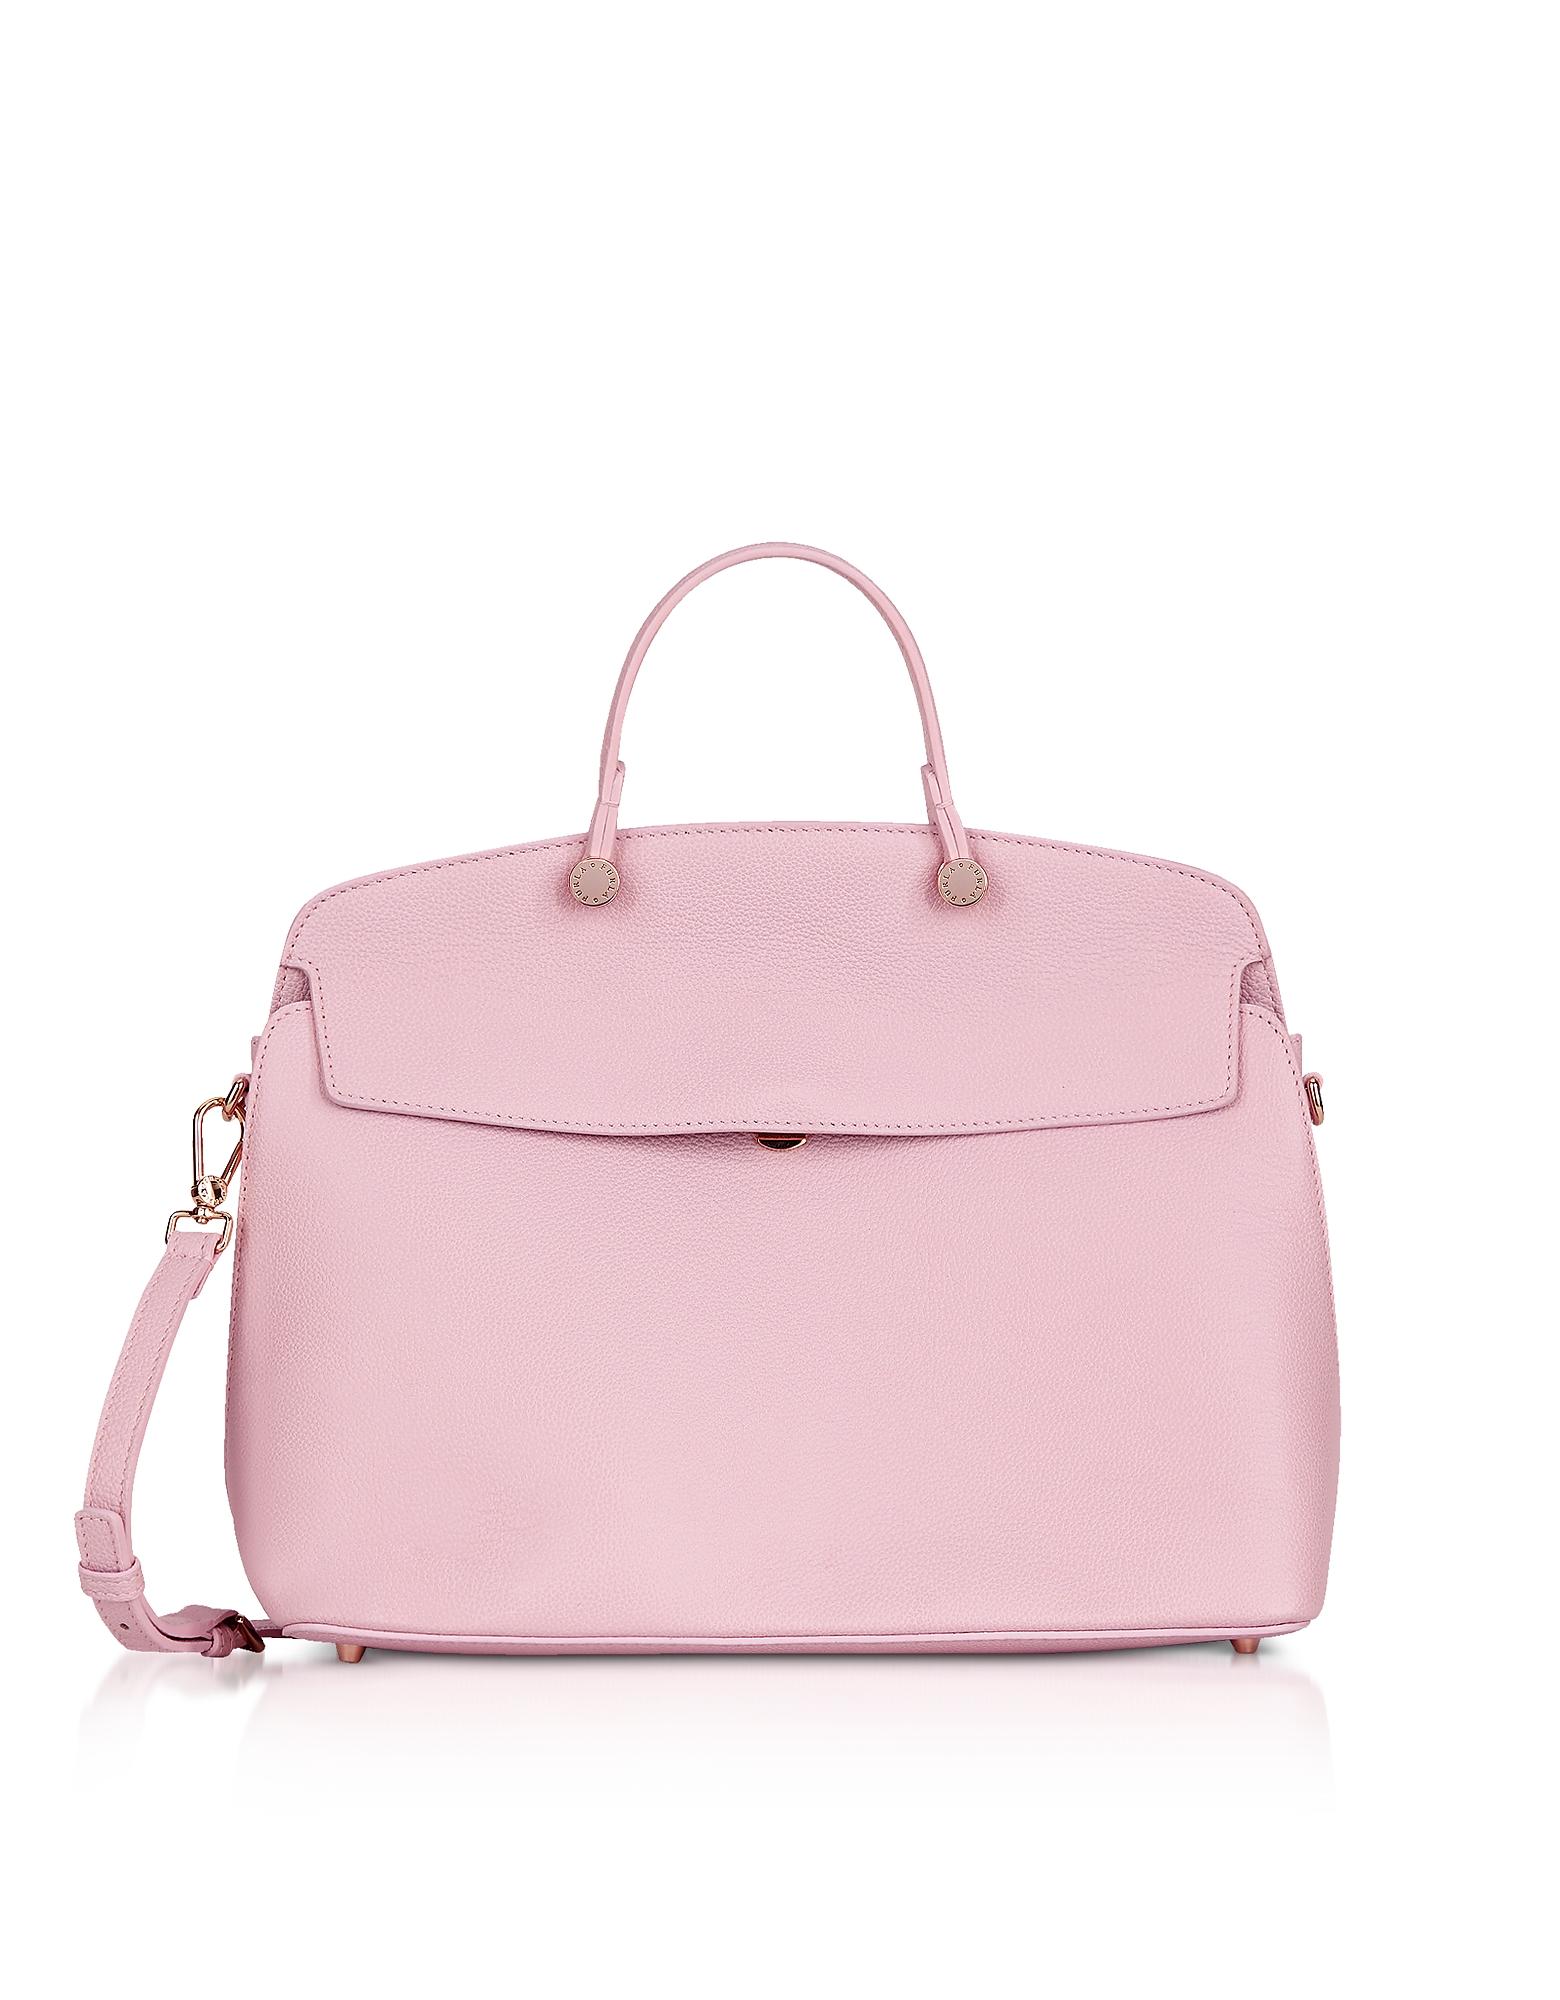 Furla Handbags, My Piper Medium Top Handle Satchel Bag